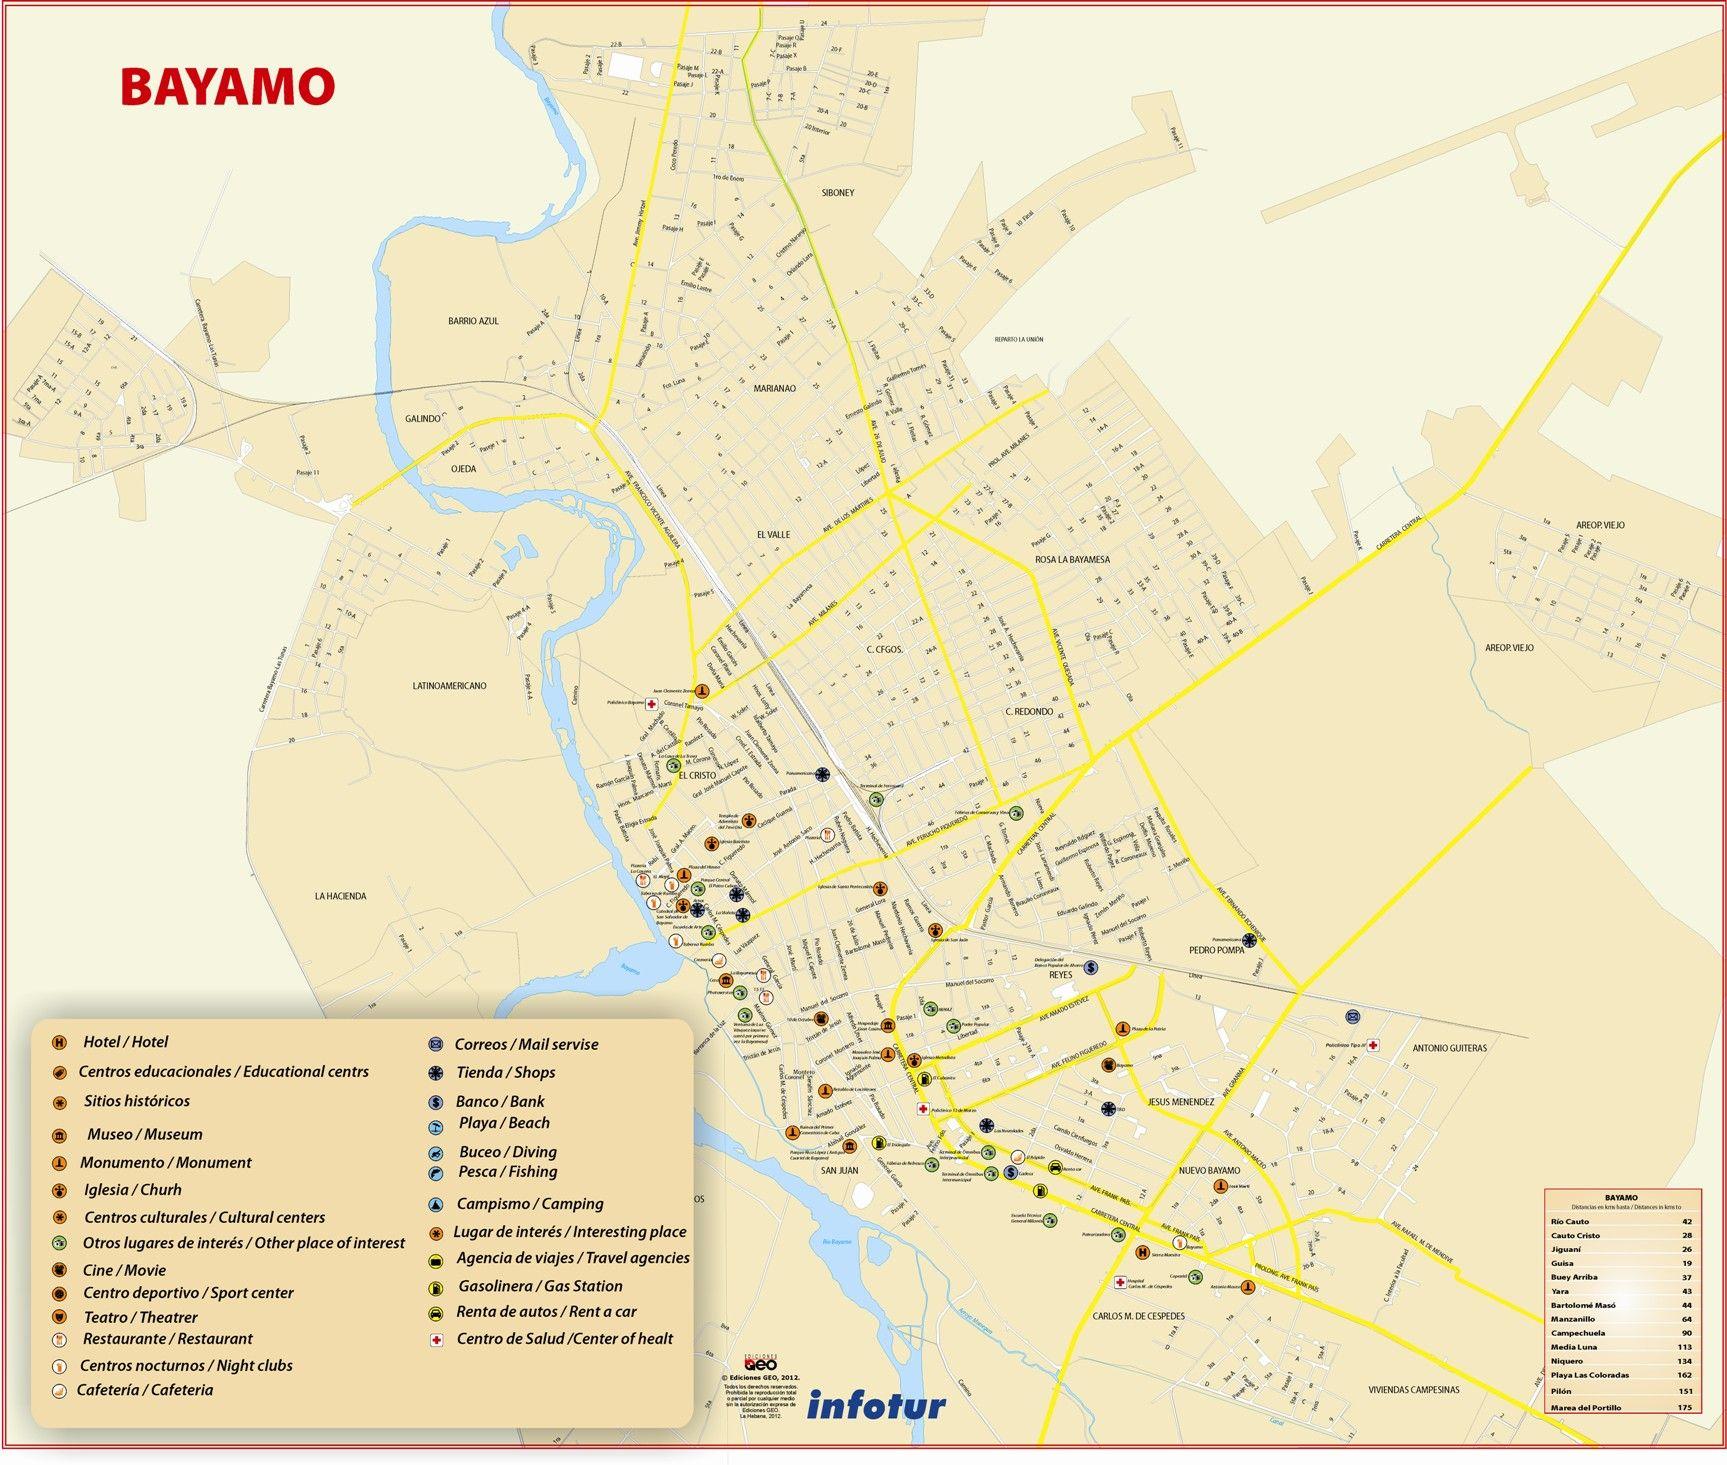 Plano de Bayamo provincia de Granma 2011 CUBA Pinterest